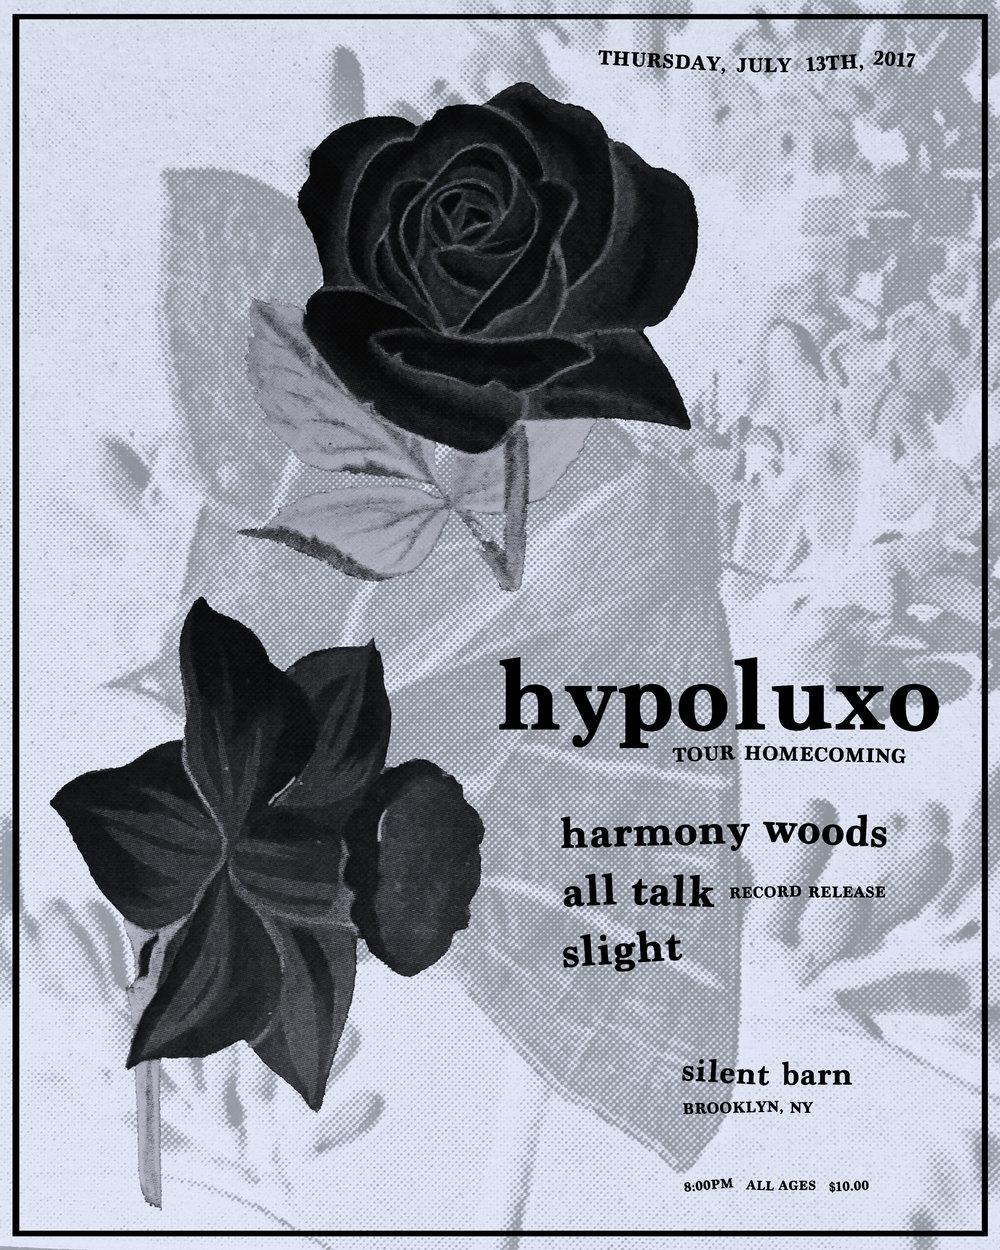 Flyer-Hypoluxo613-LightBlue copy.jpg